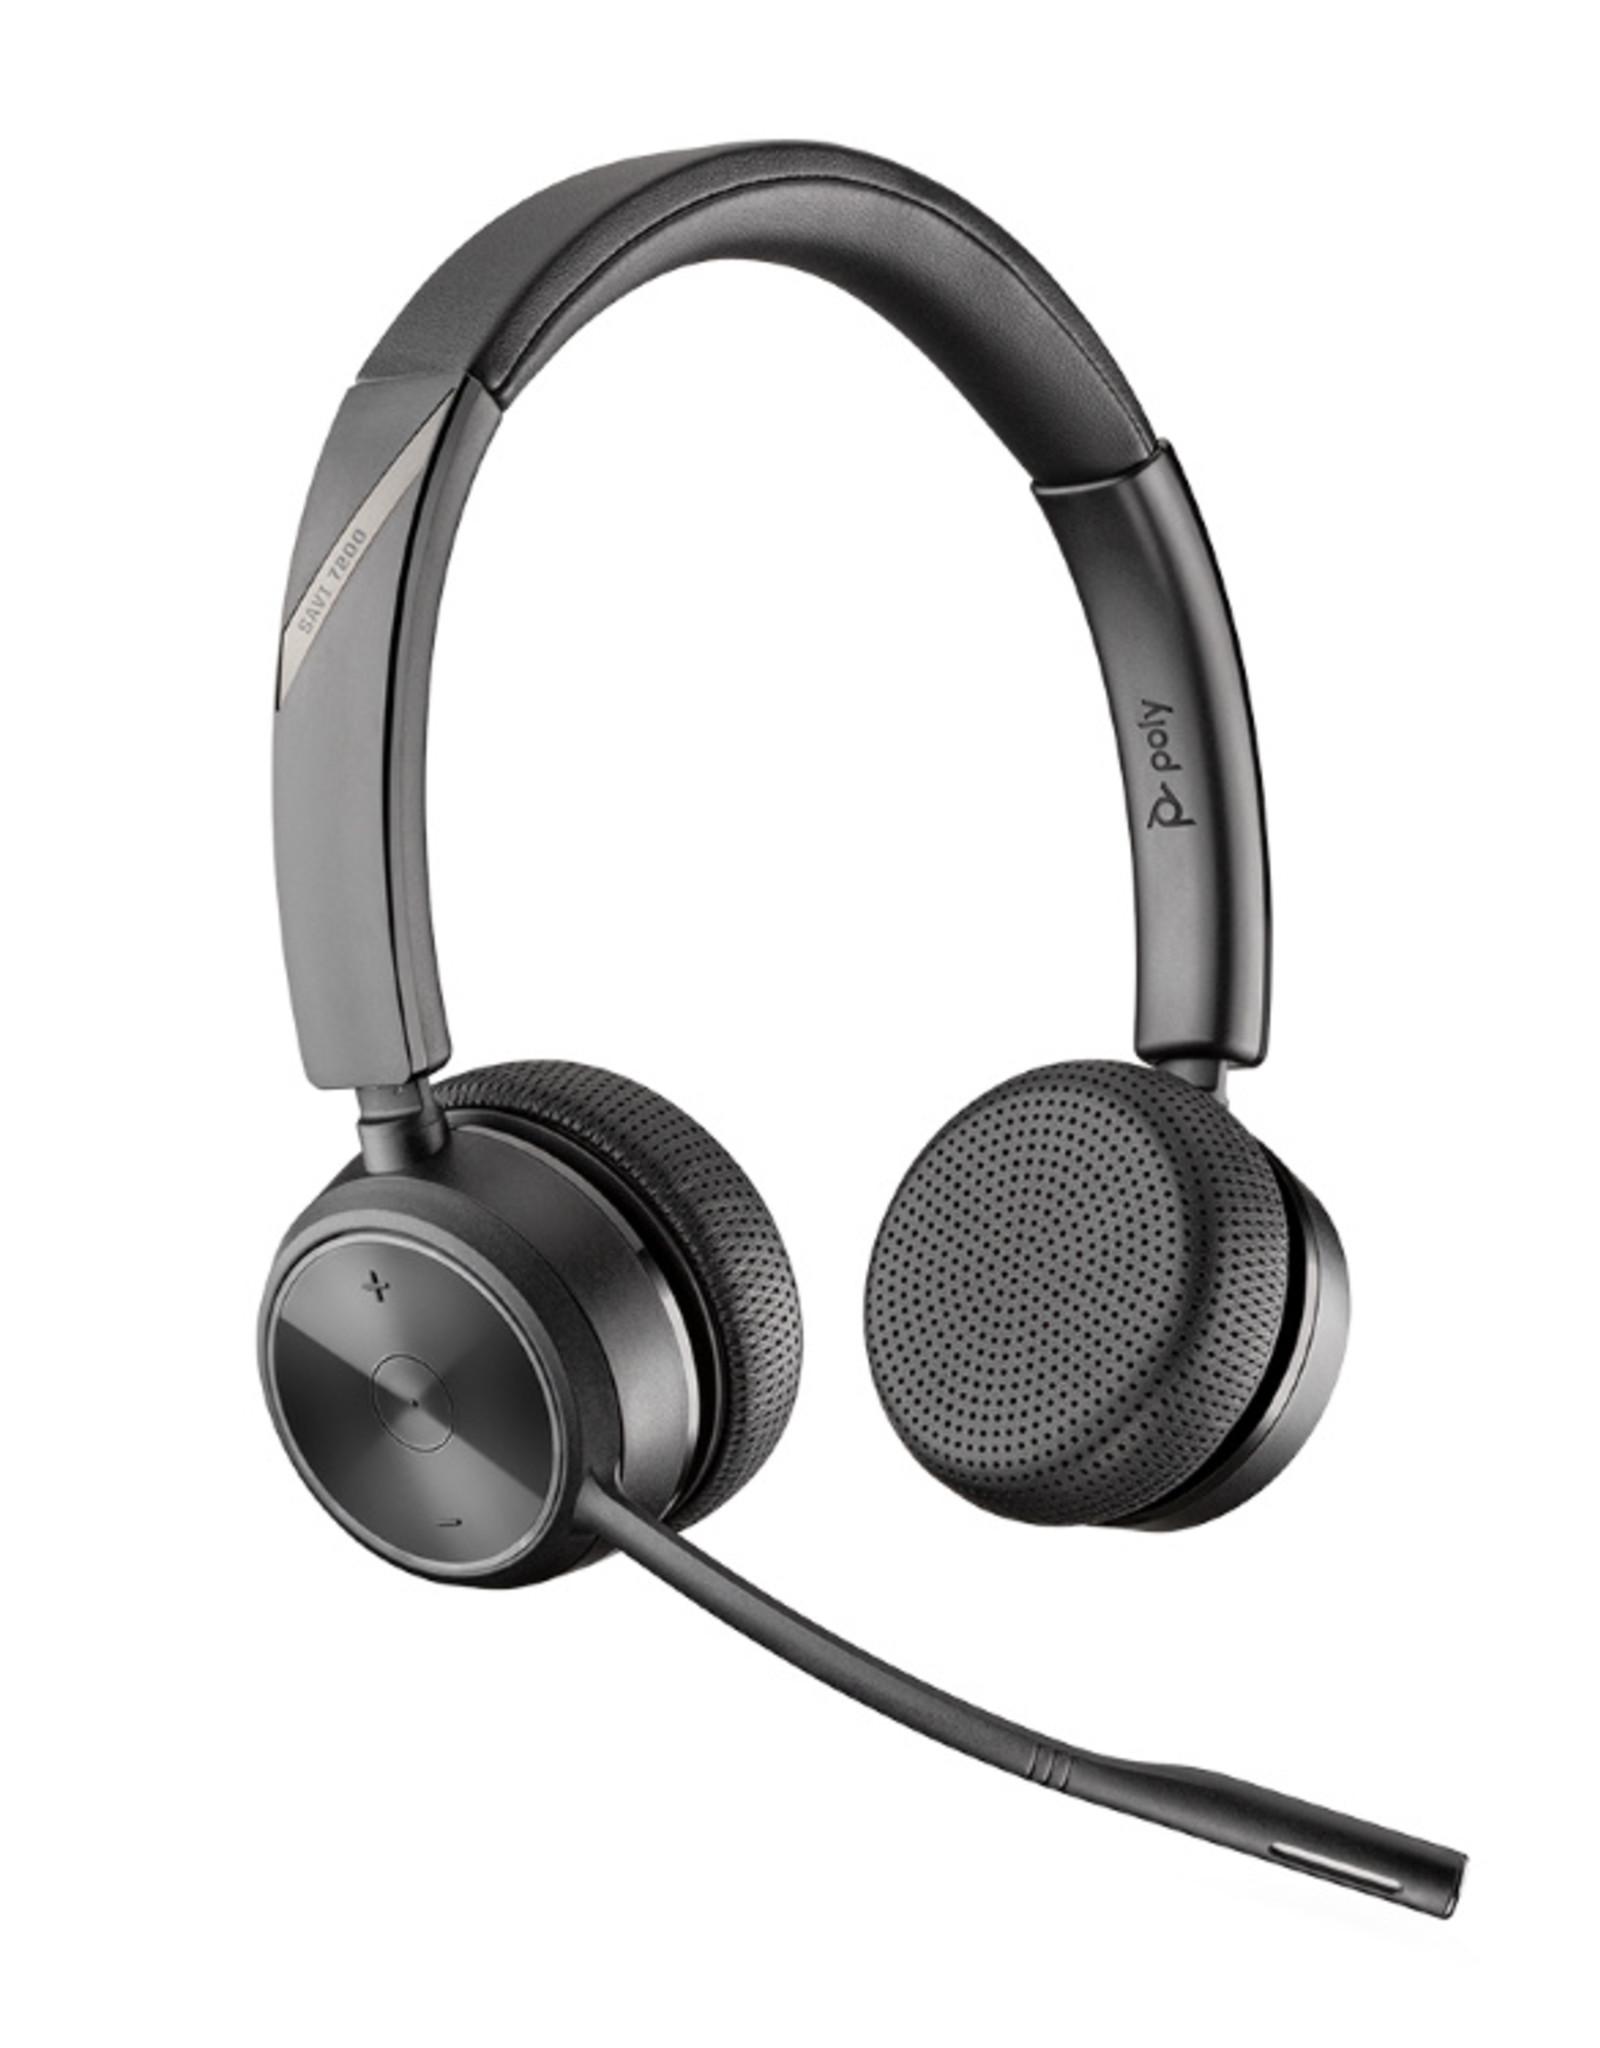 Plantronics Plantronics Savi 7220 - Dect - Stereo Headset